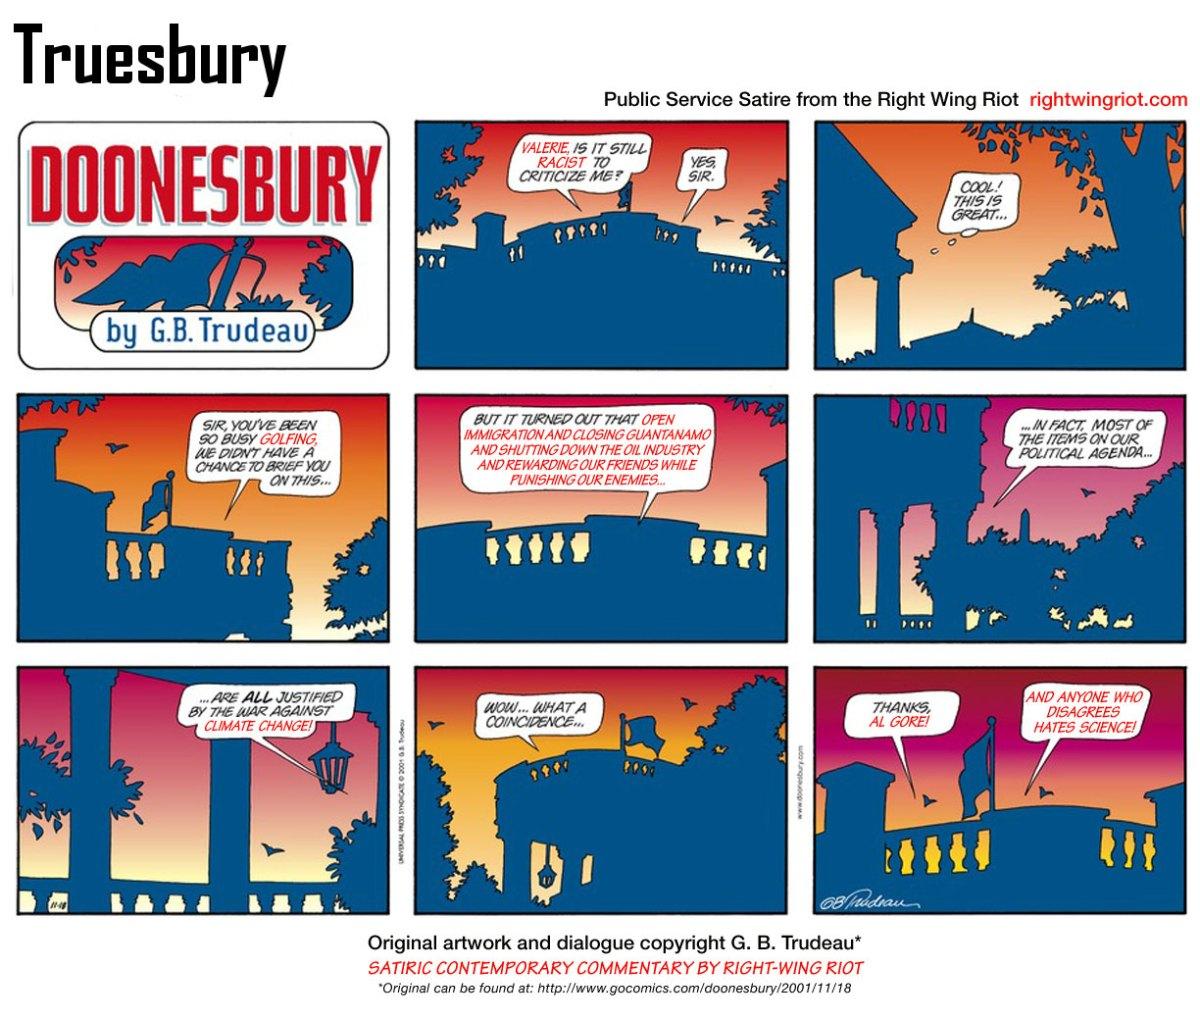 Truesbury_Sept9_2014